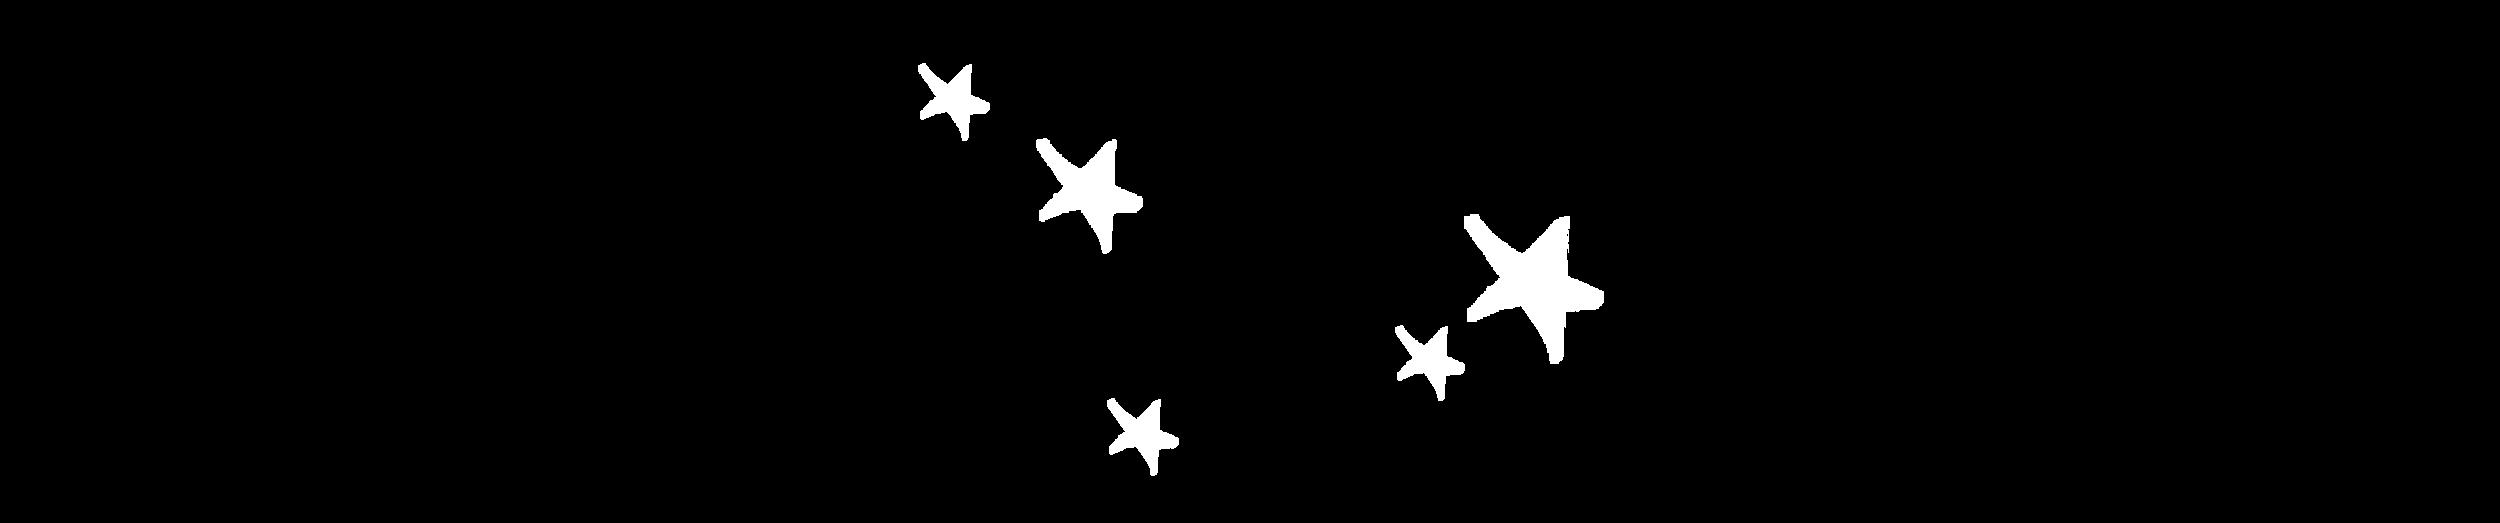 white-stars.png